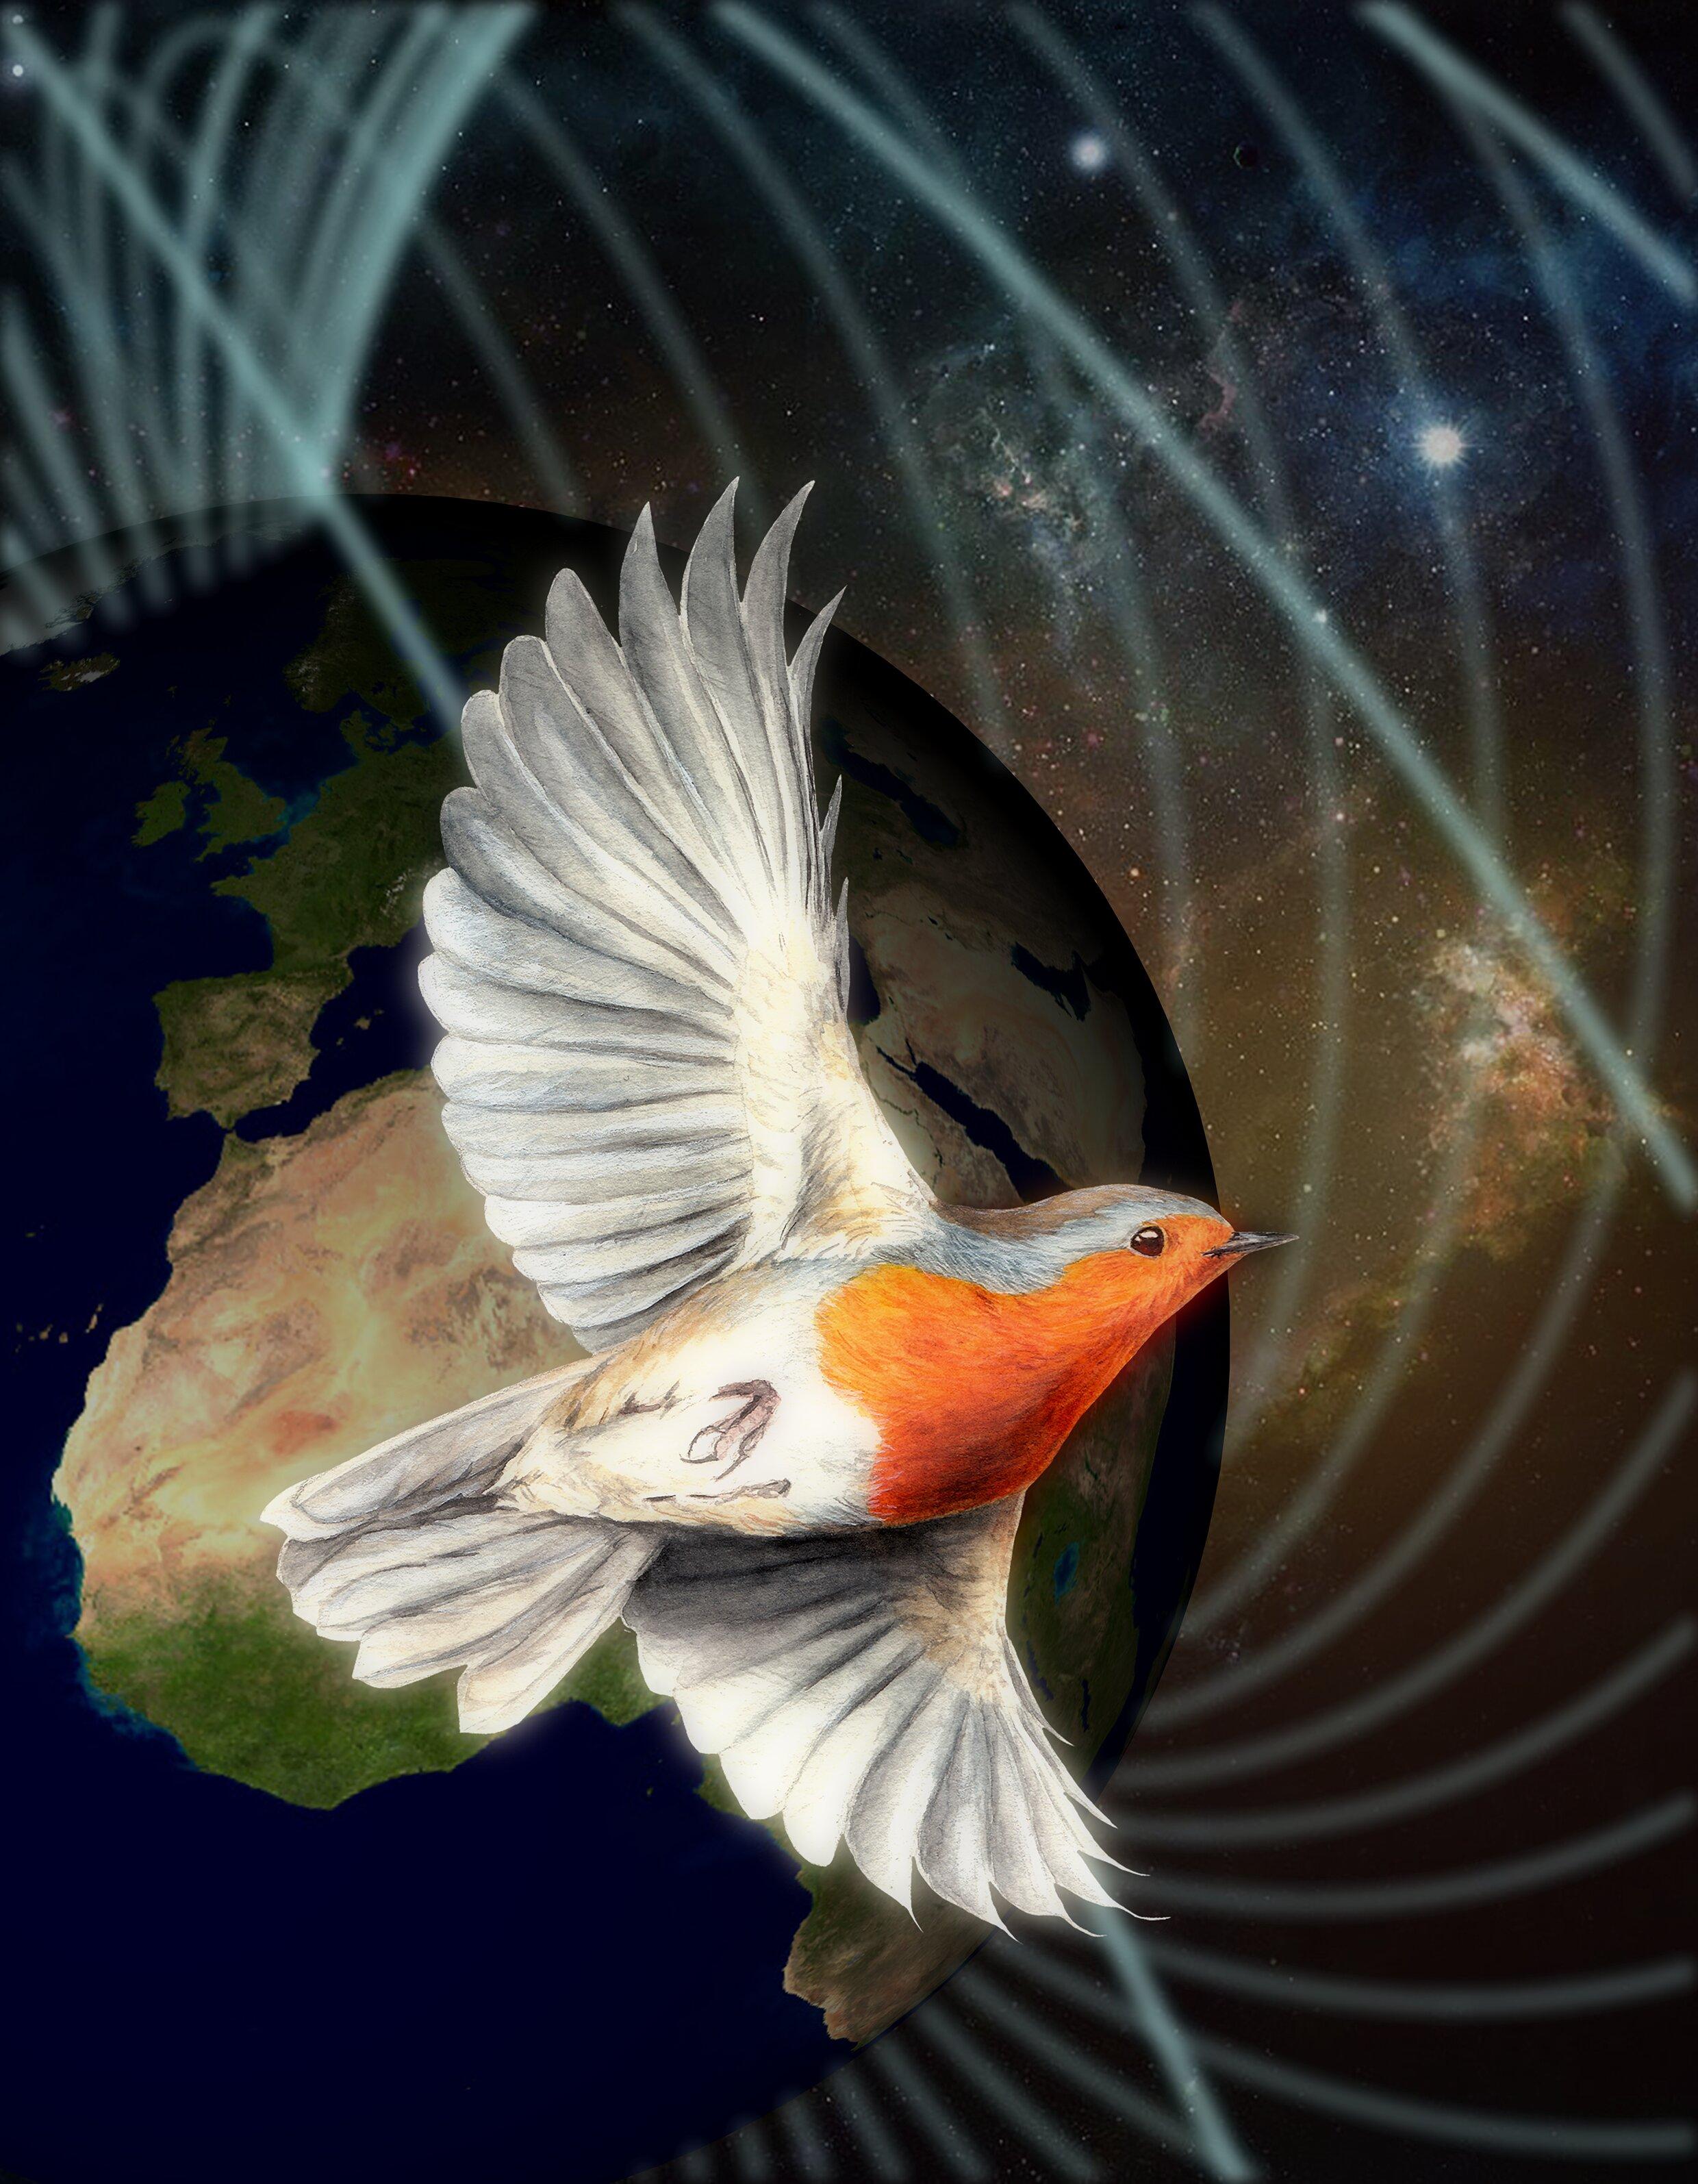 Quantum birds: Shedding light on the mechanism of magnetic sensing in birds